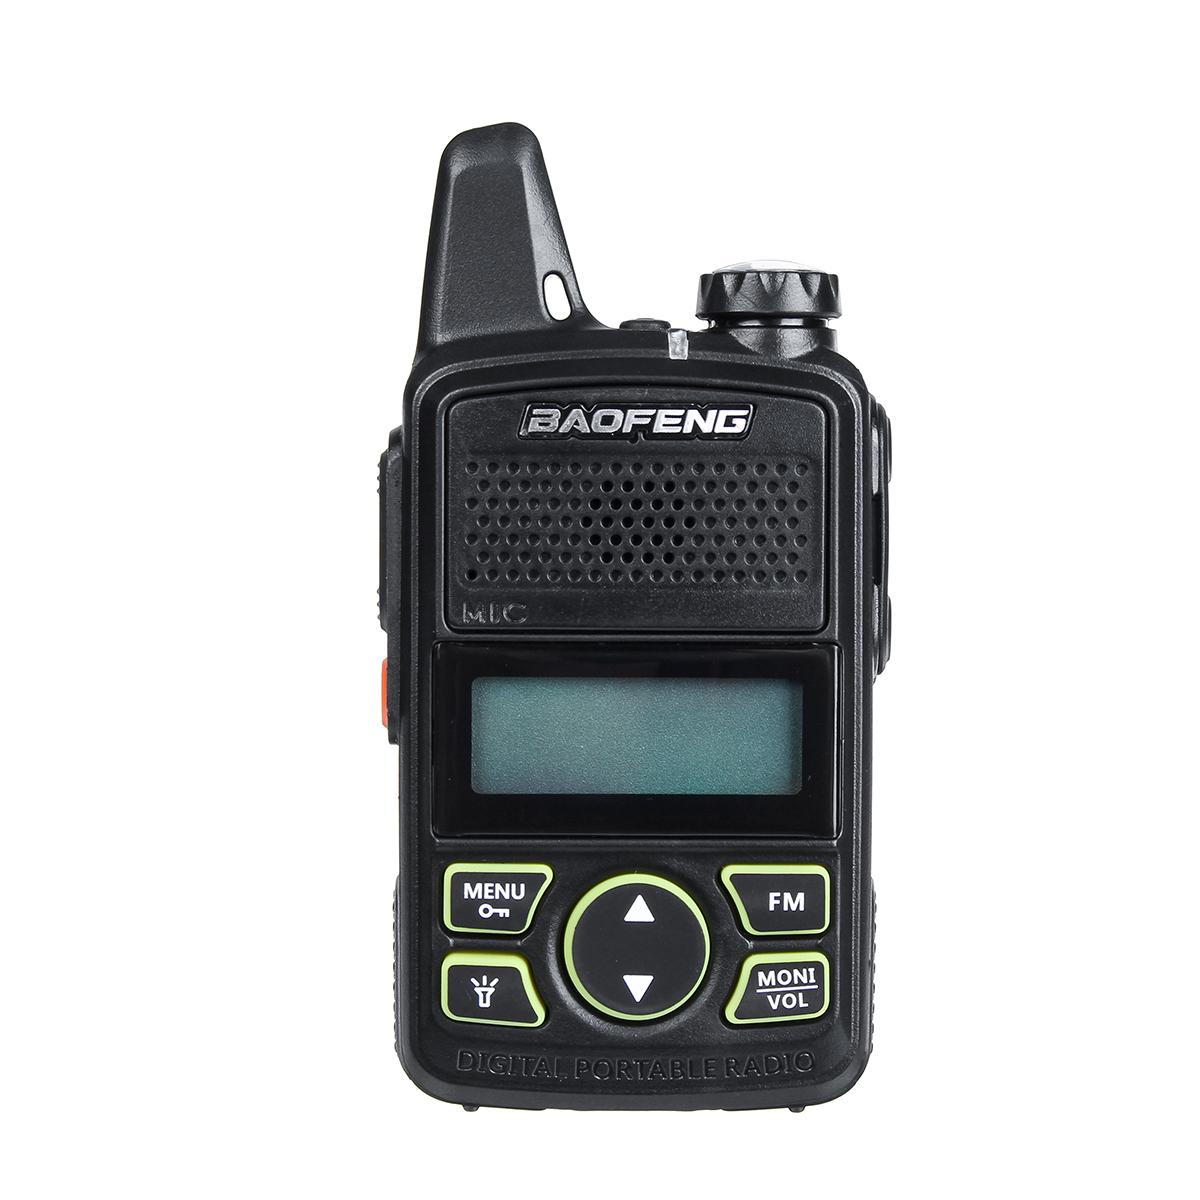 Baofeng T1 Plus 15 Вт Двойной Стандарты Ручной 50 CTCSS Тон Двухсторонний Радио Walkie Talkie УВЧ 400-470 МГц Мини Walkie Talkie